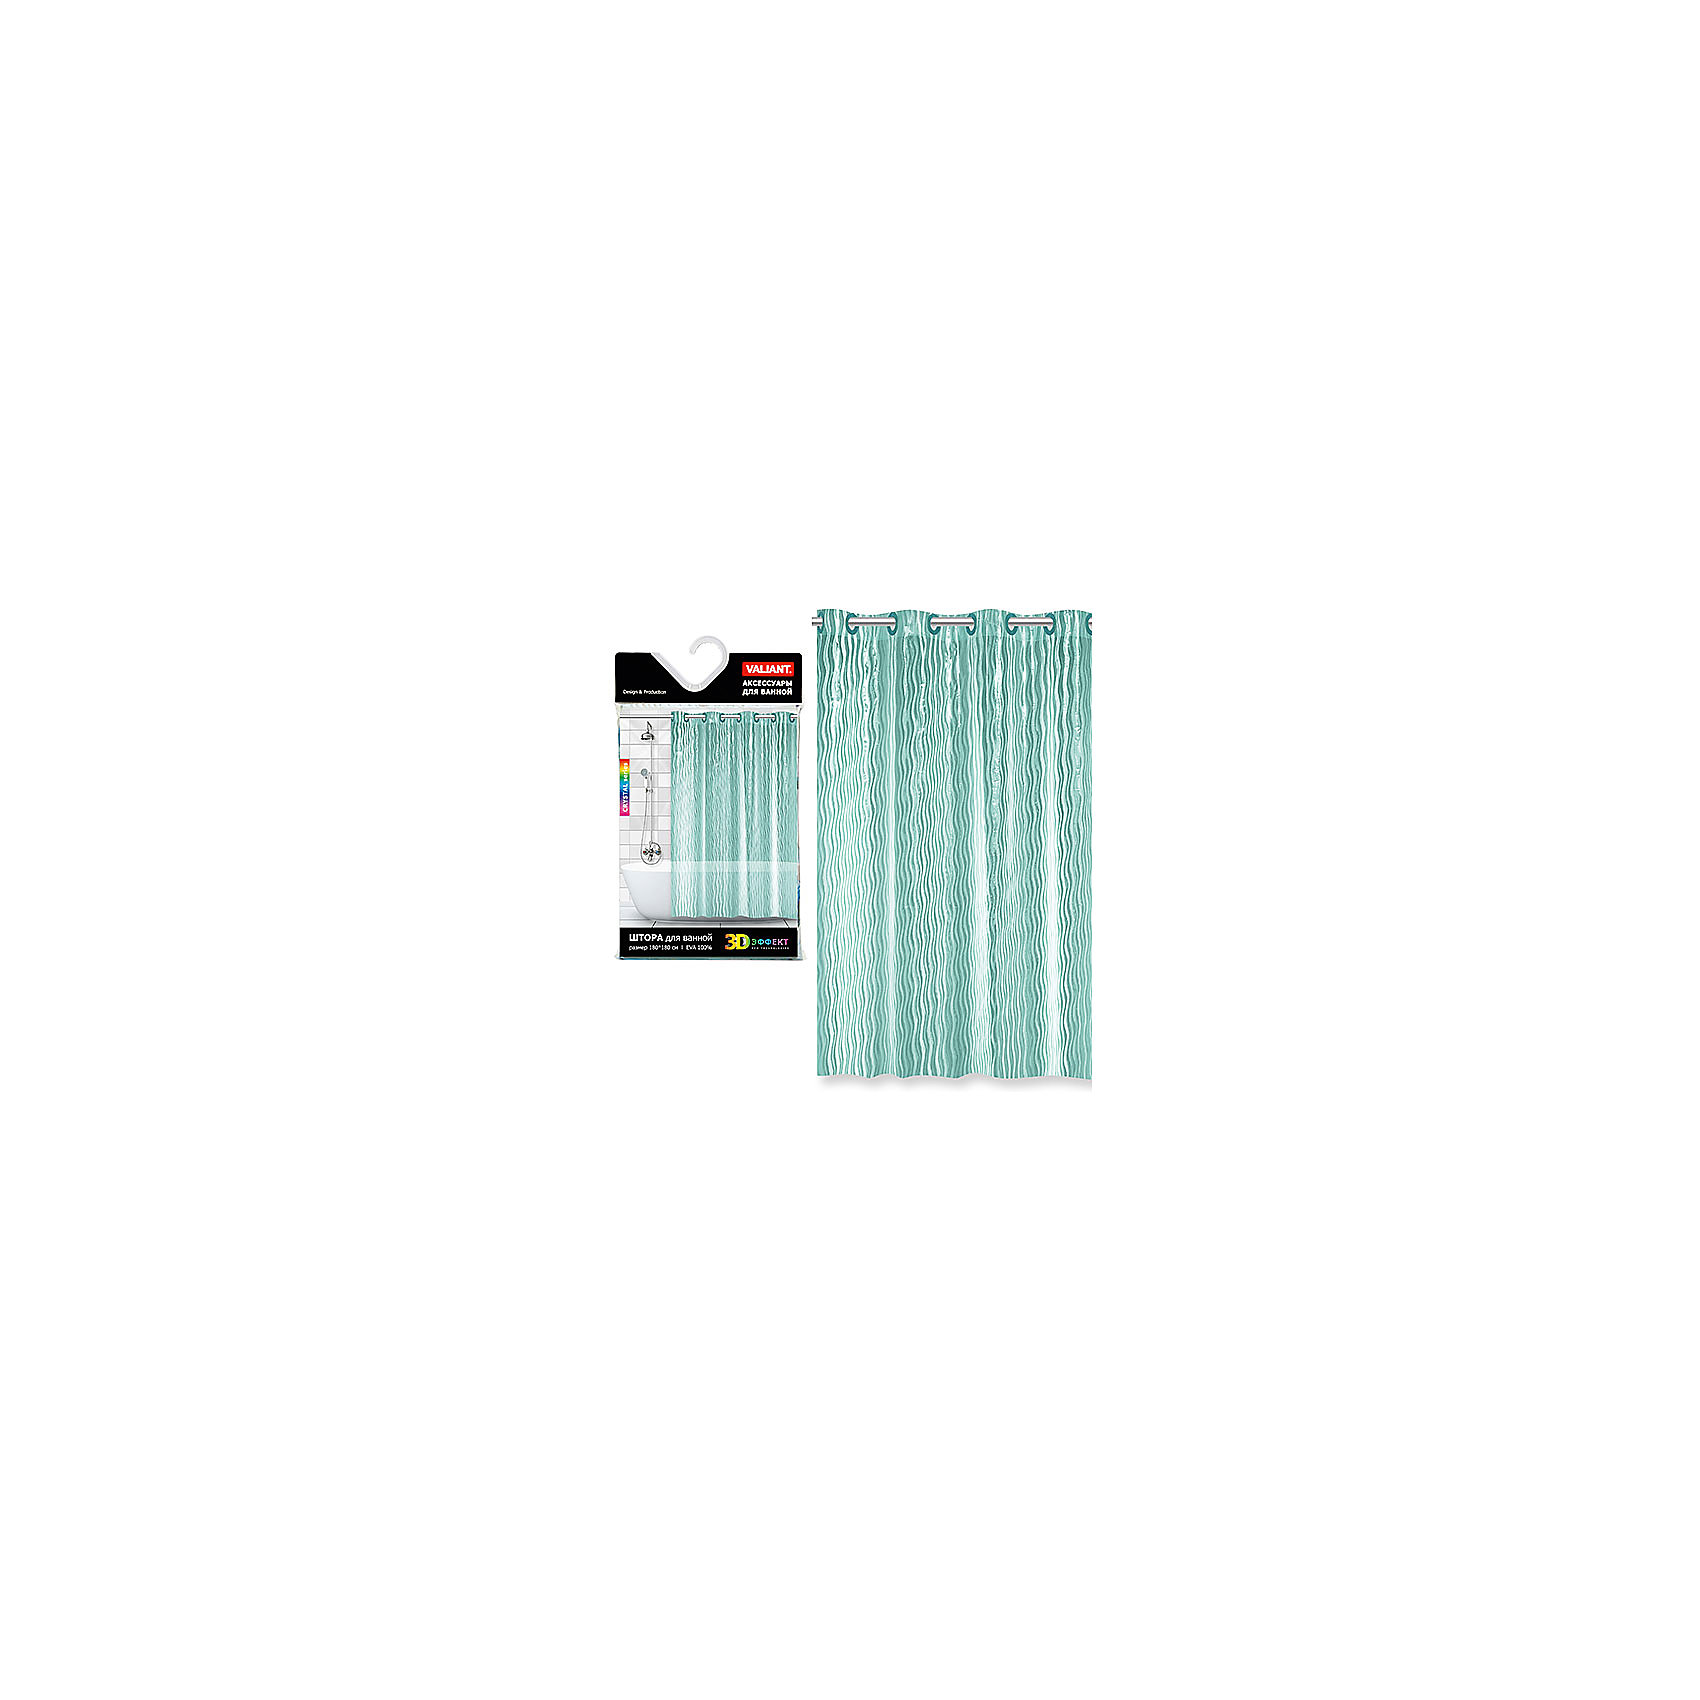 VALIANT Штора для ванной, EVA, 180*180 см, WATER LINE, Valiant